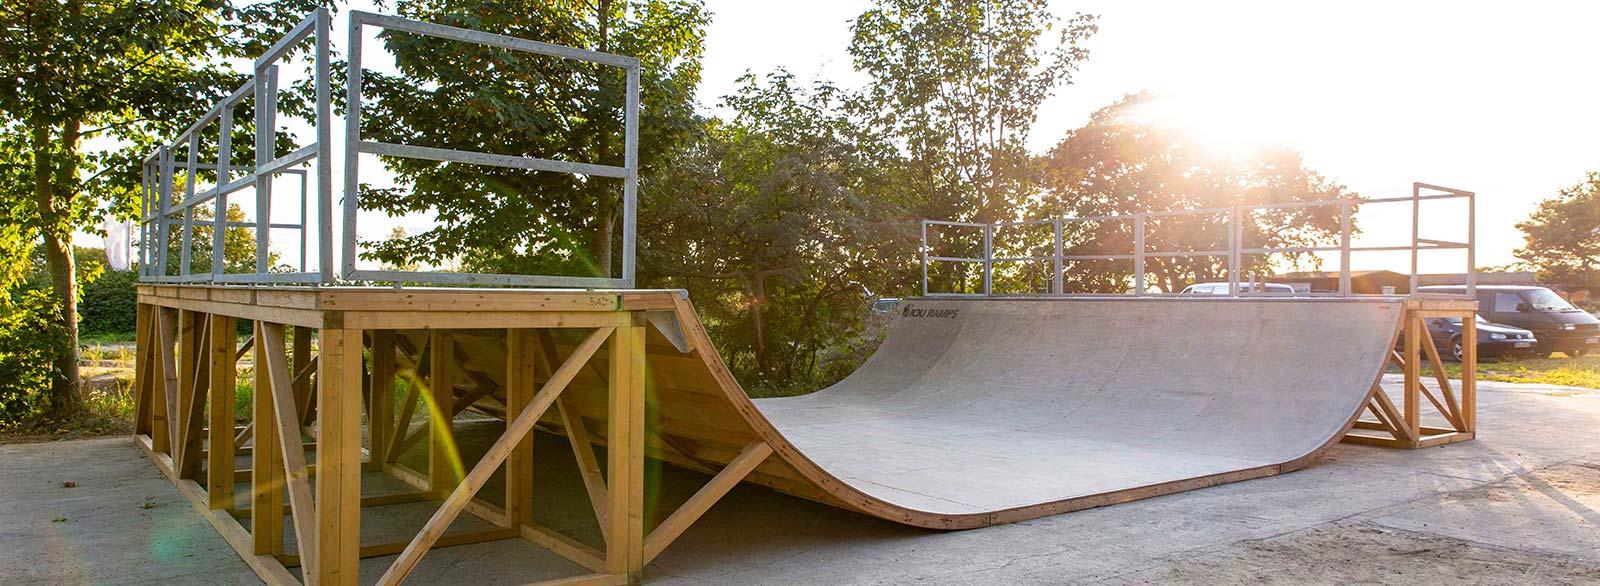 portable_skateboard_minirampe_2